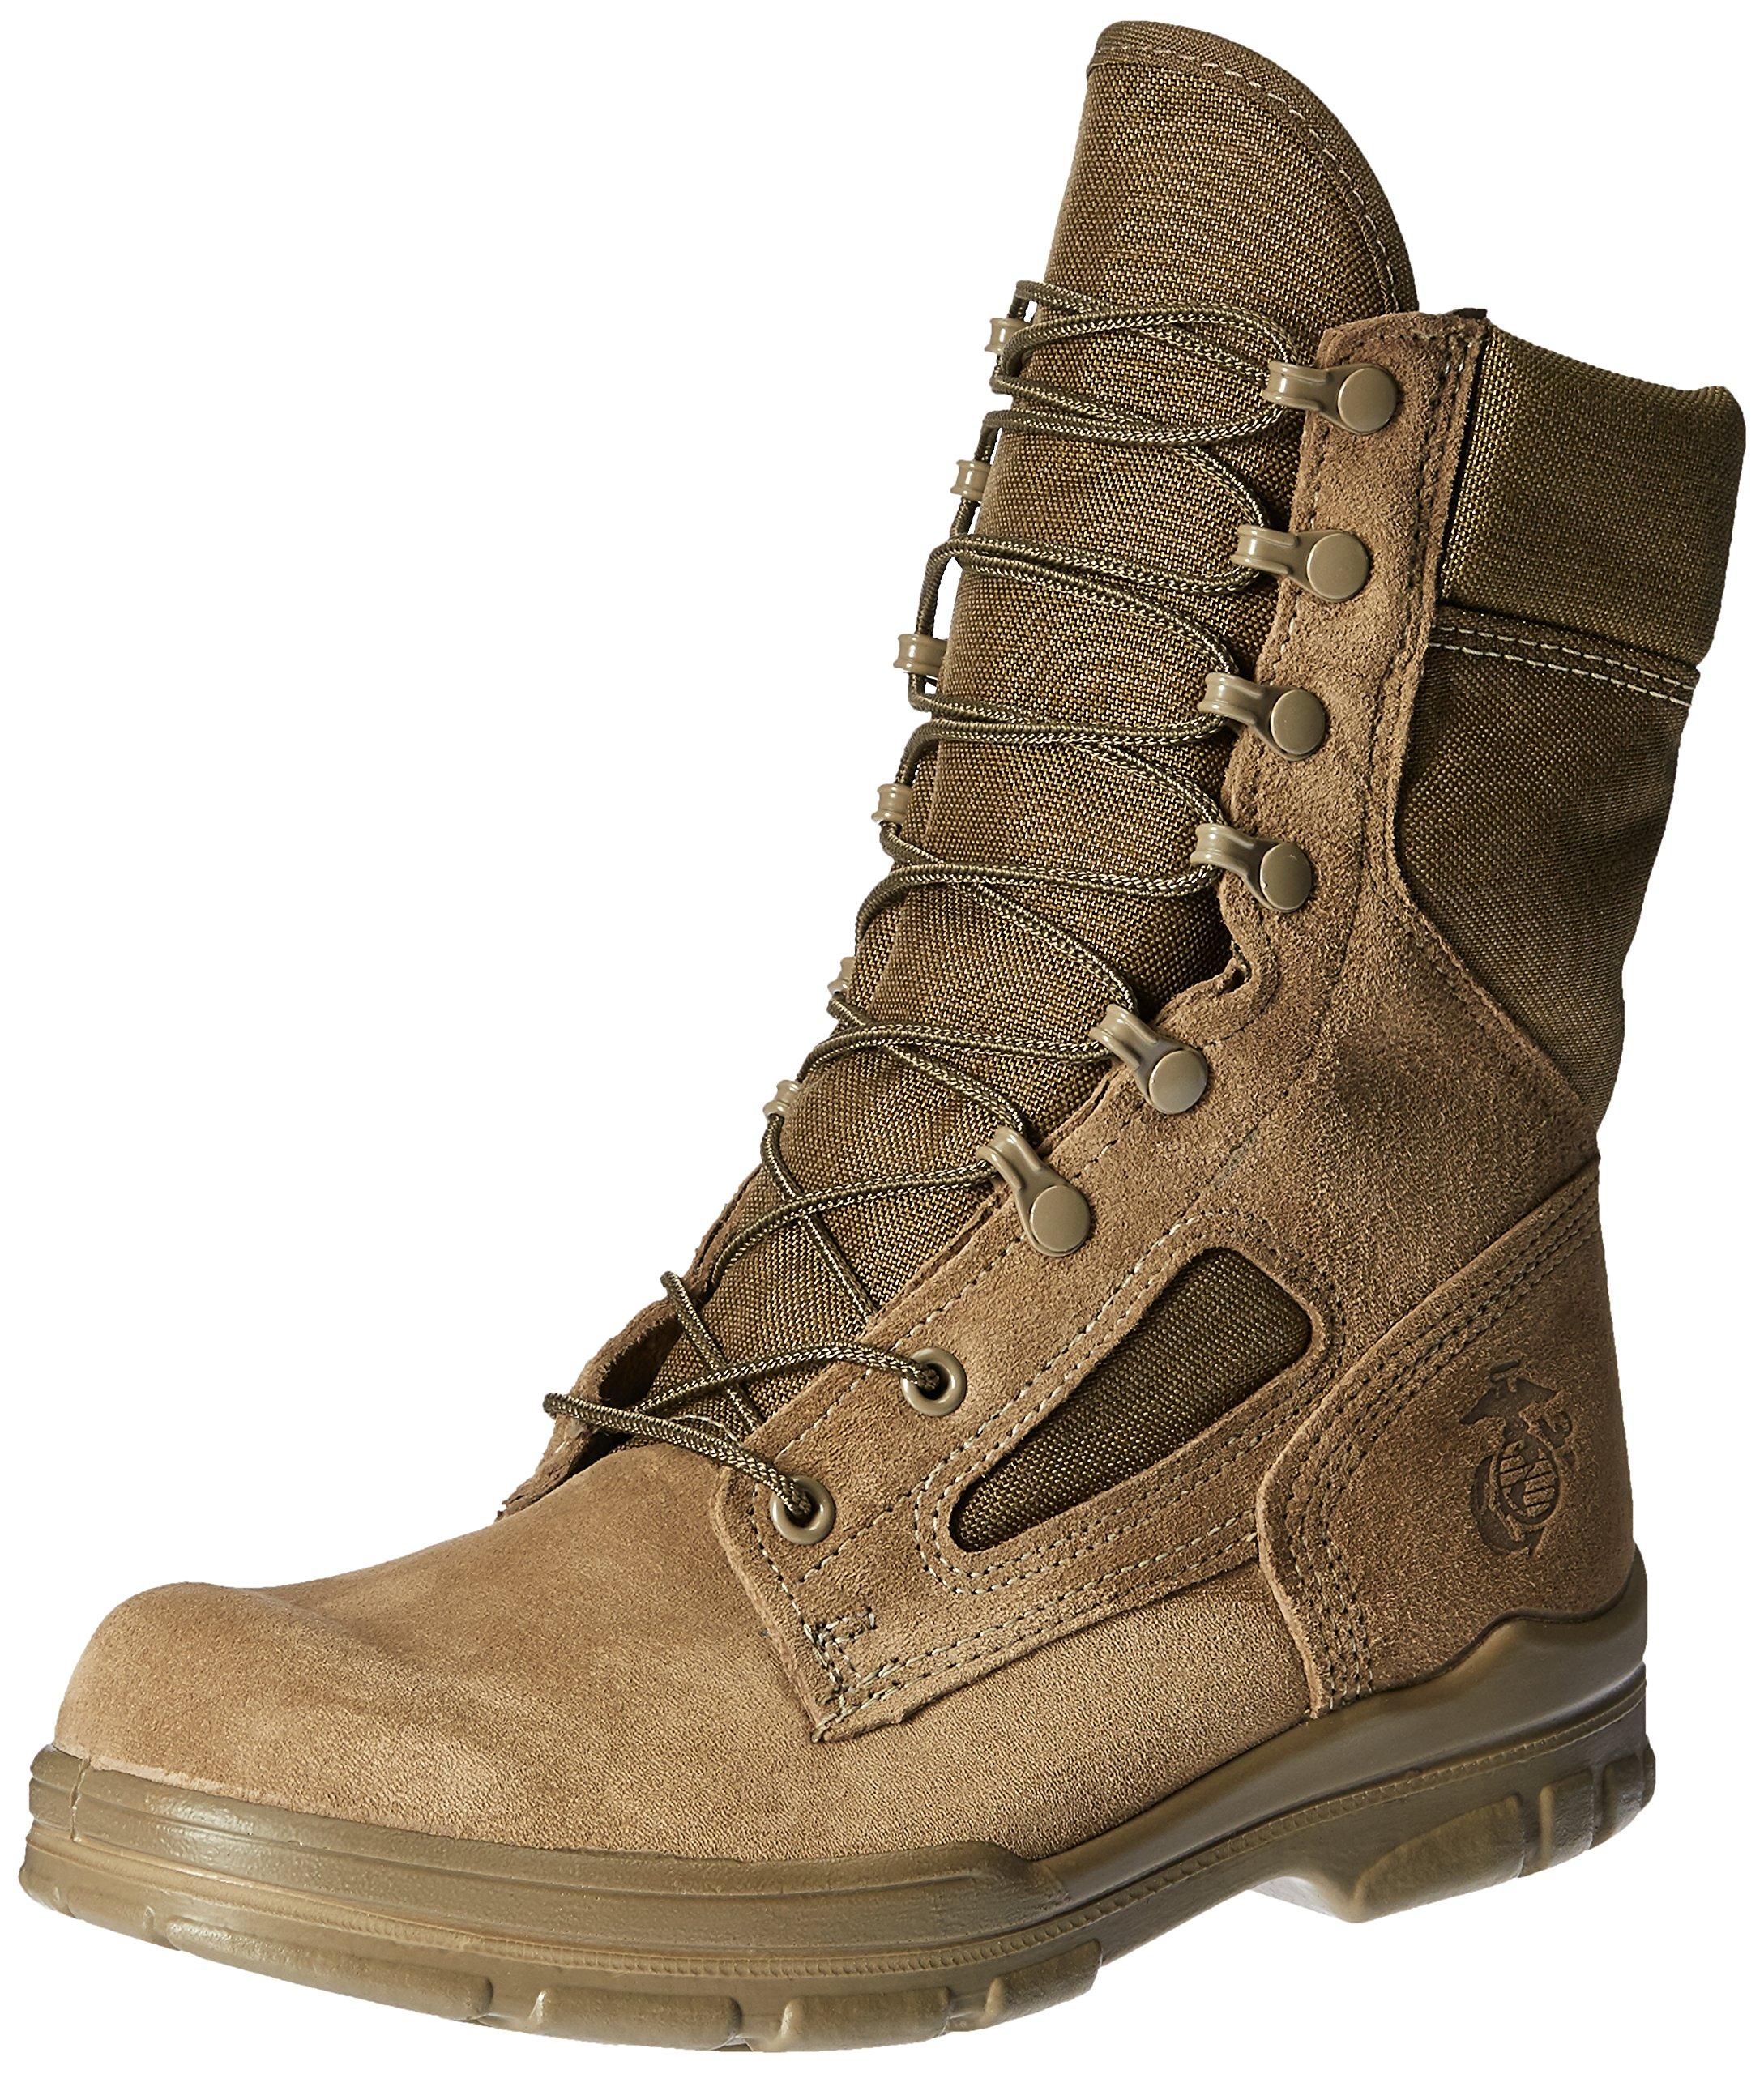 Bates Men's USMC Lightweight DuraShocks Military & Tactical Boot, Olive Mojave, 9.5 M US